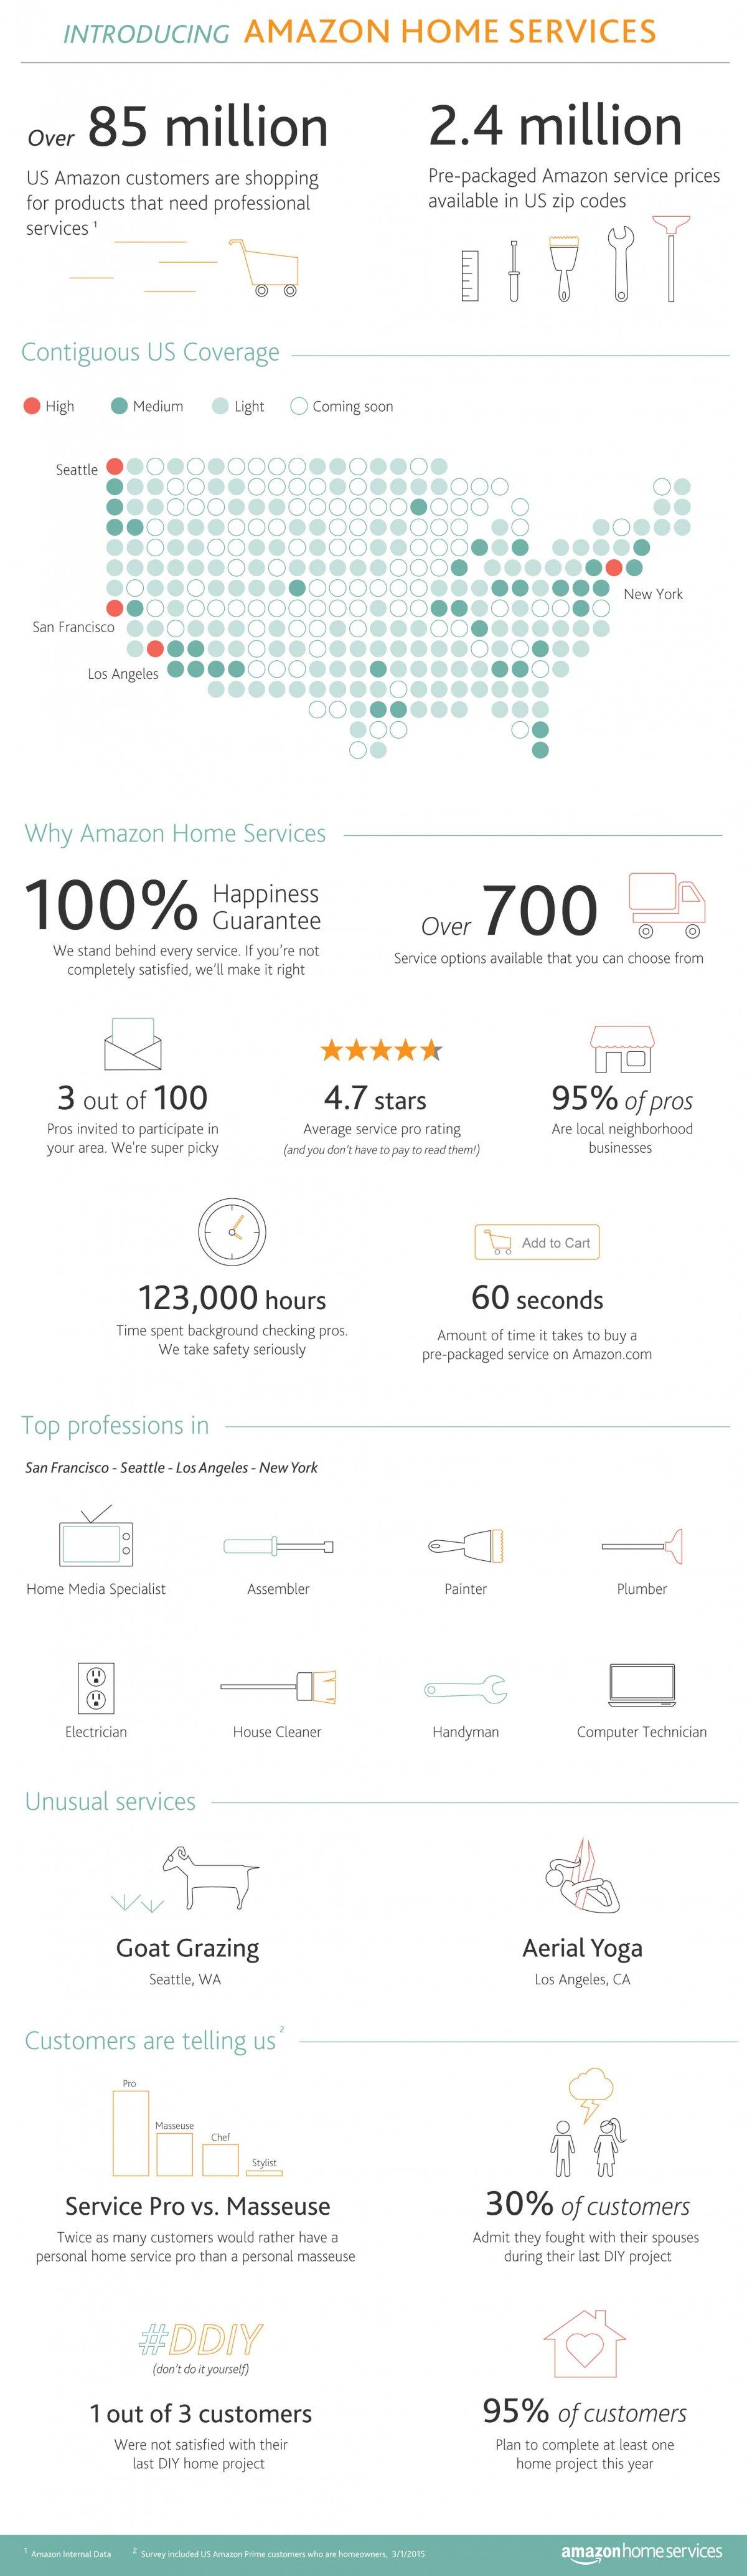 ahs_infographic_final